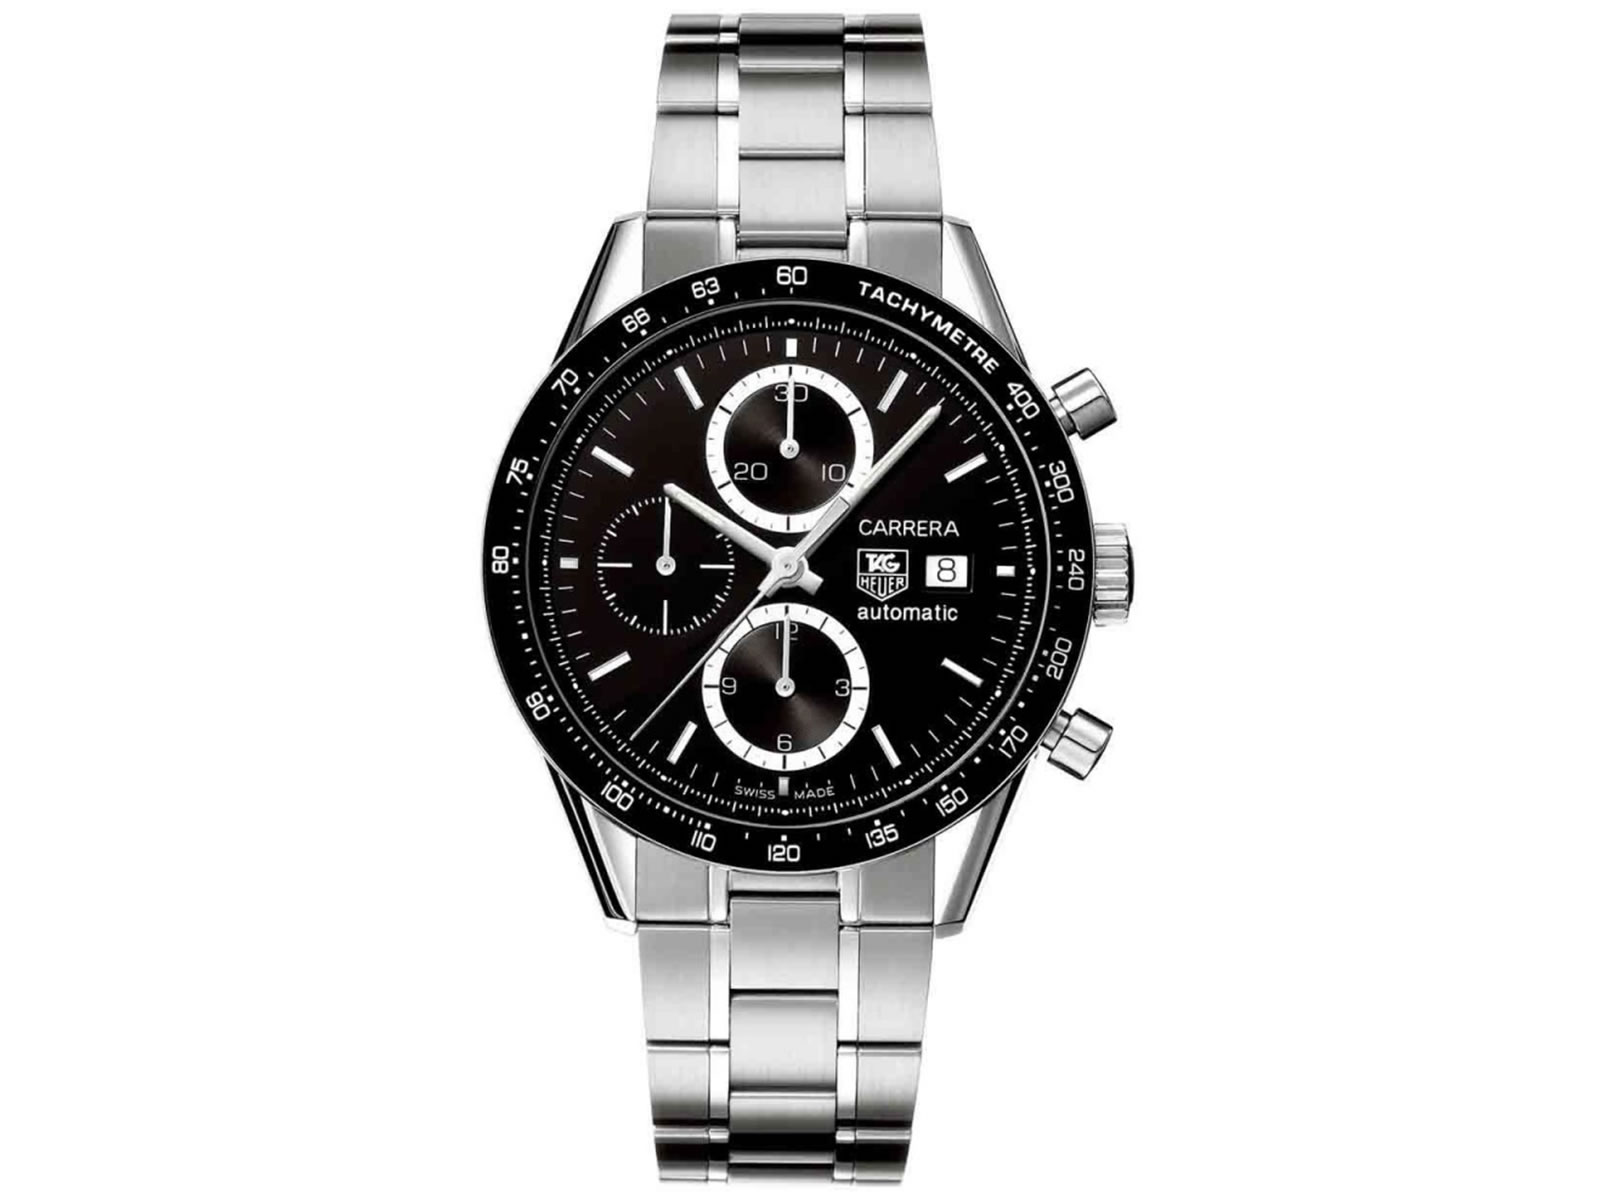 cv2010-ba0794-tag-heuer-carrera-chronograph-tachymeter-.jpg